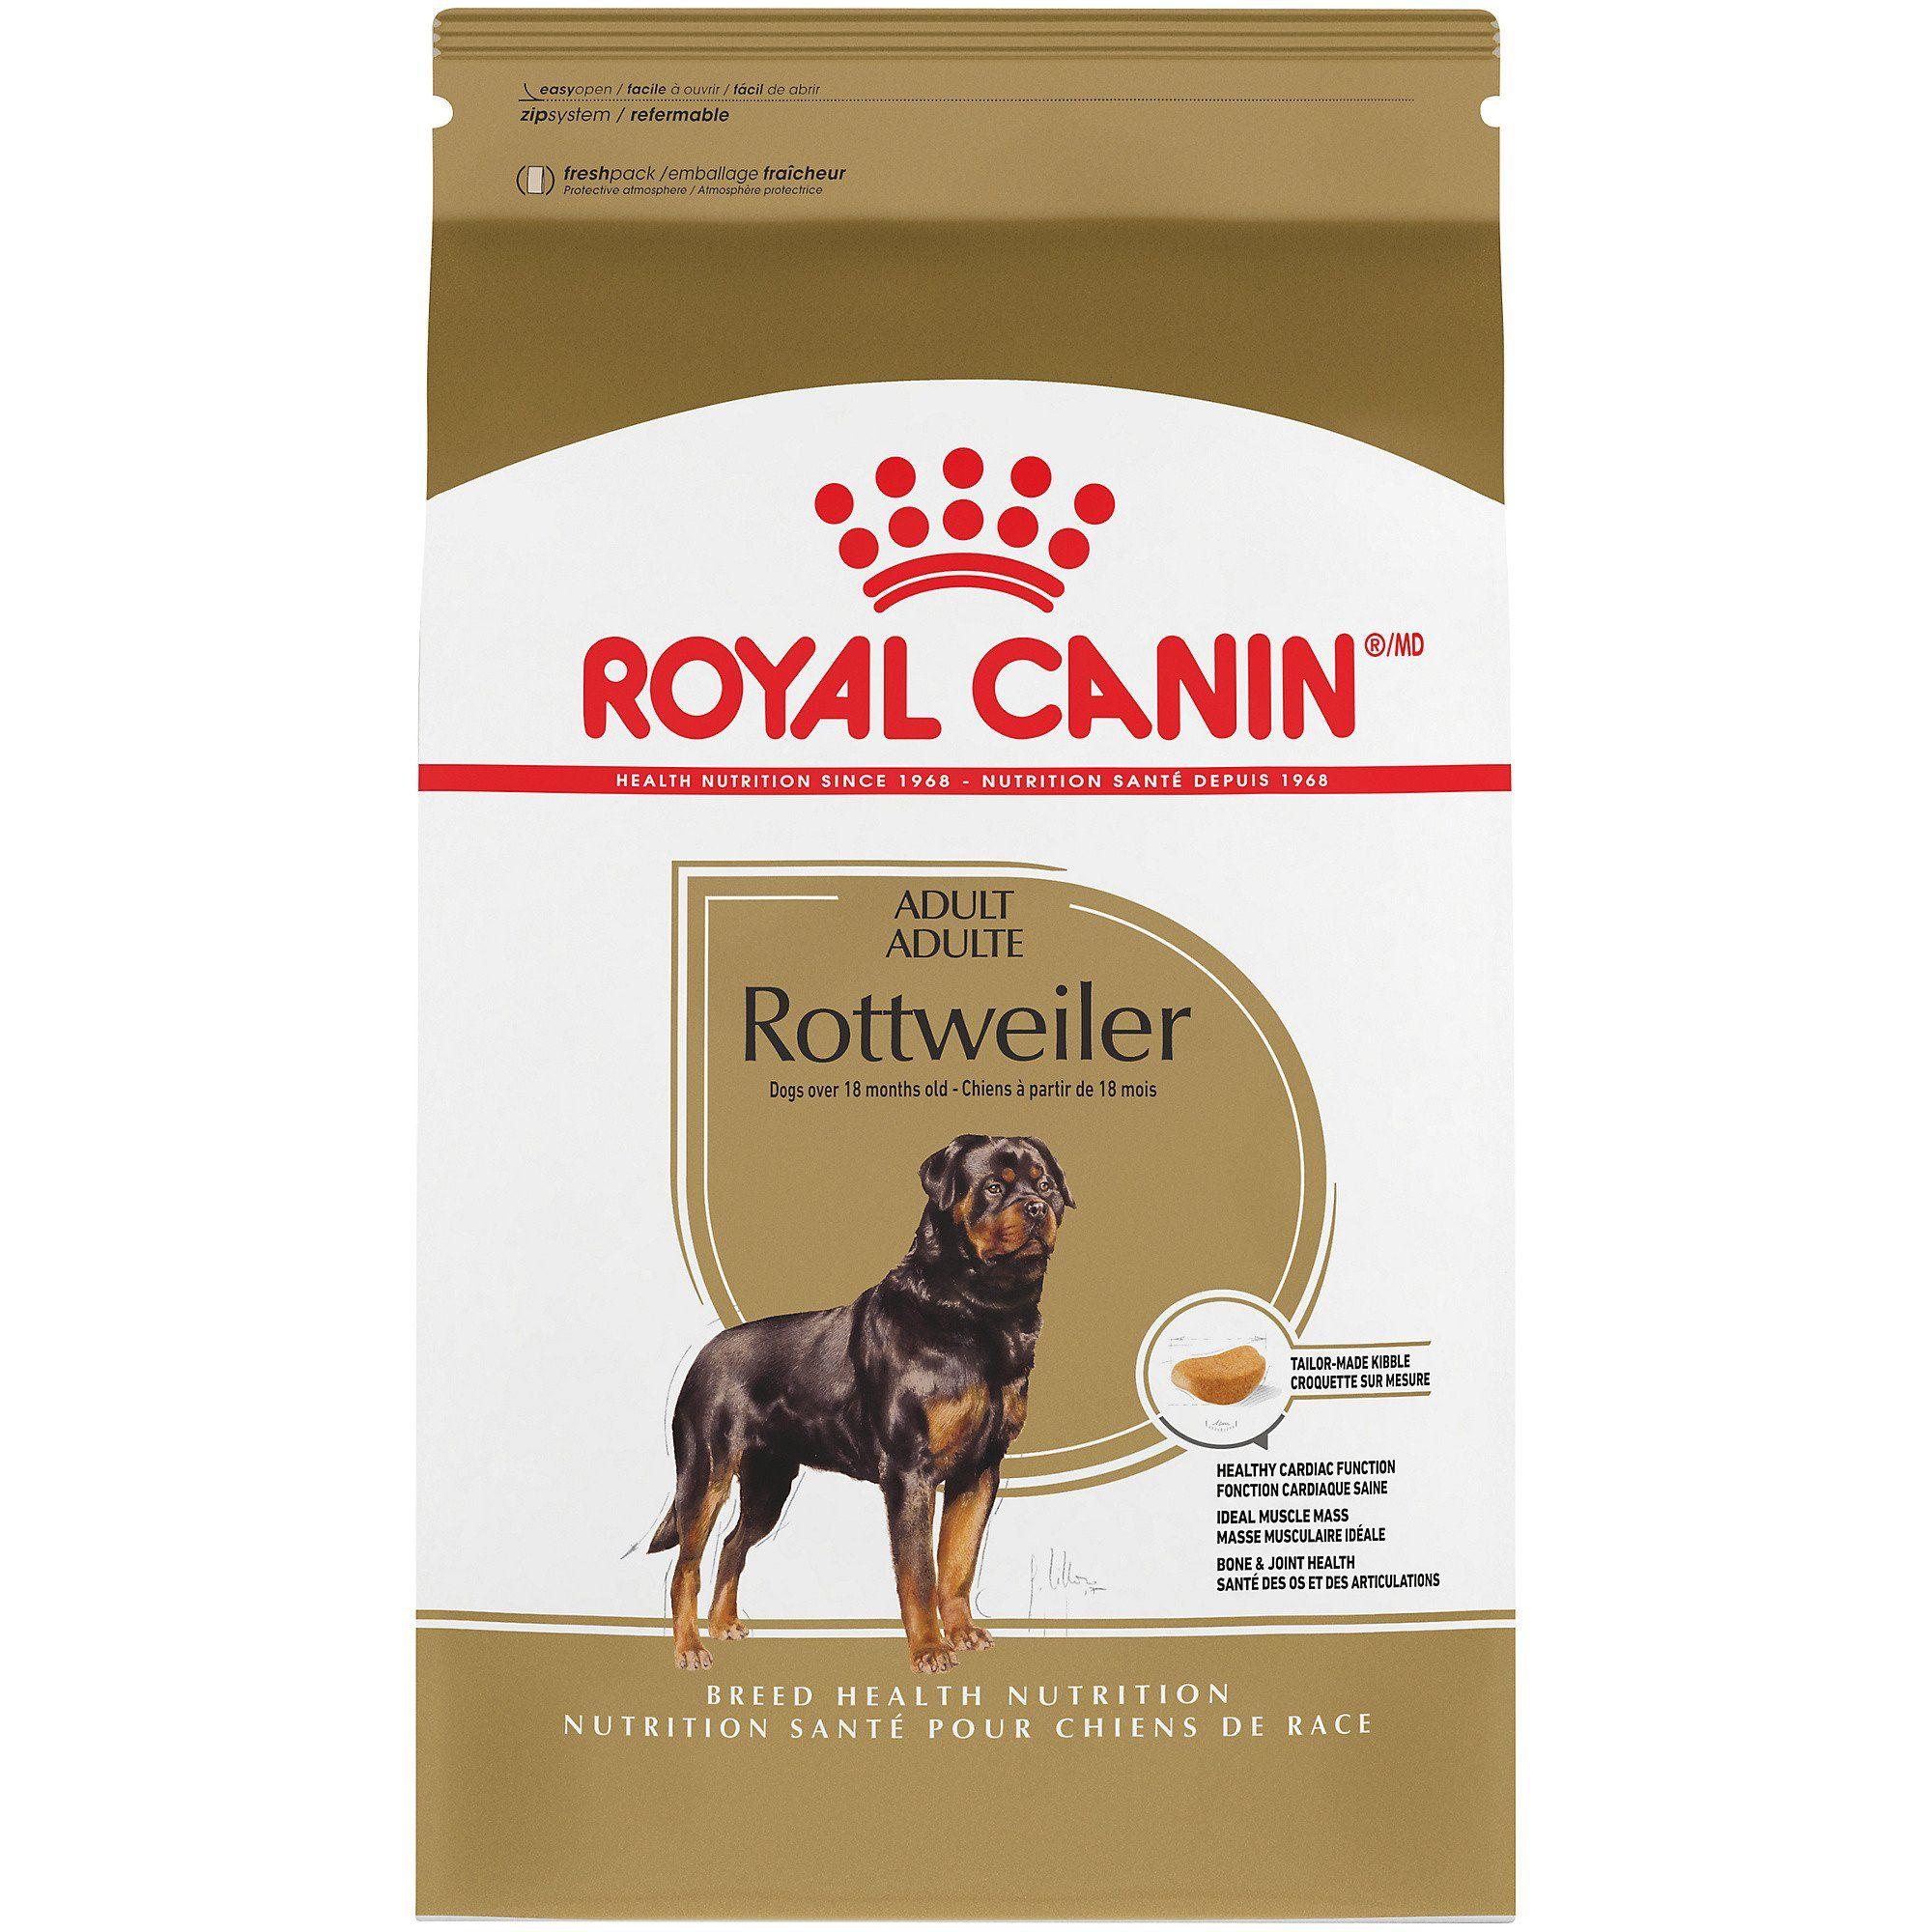 Royal Canin Breed Health Nutrition Rottweiler Adult Dry Dog Food